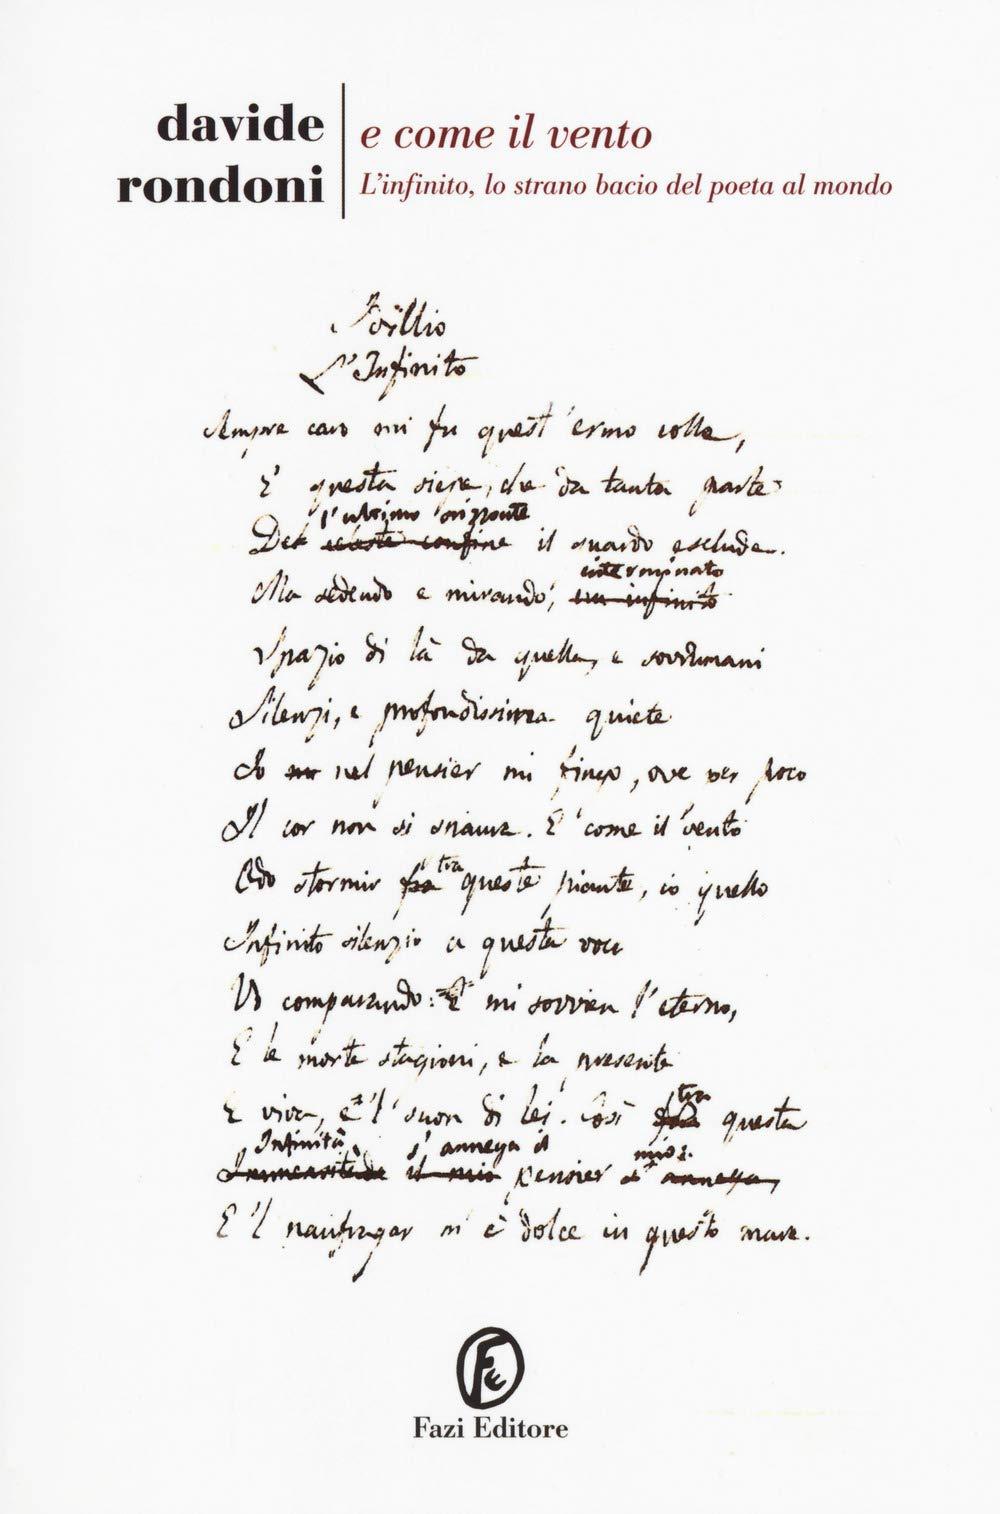 I Poeti Contemporanei 89 - 7 autori (I Poeti Contemporanei - 7 autori) (Italian Edition)